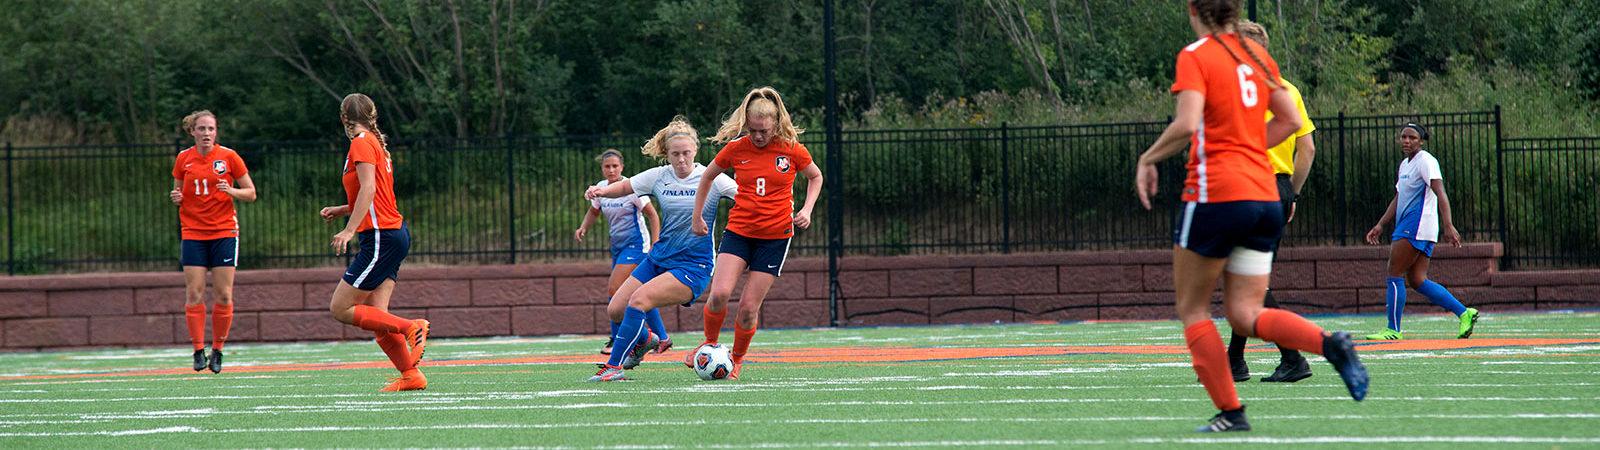 Northland College LumberJills soccer 2018-19